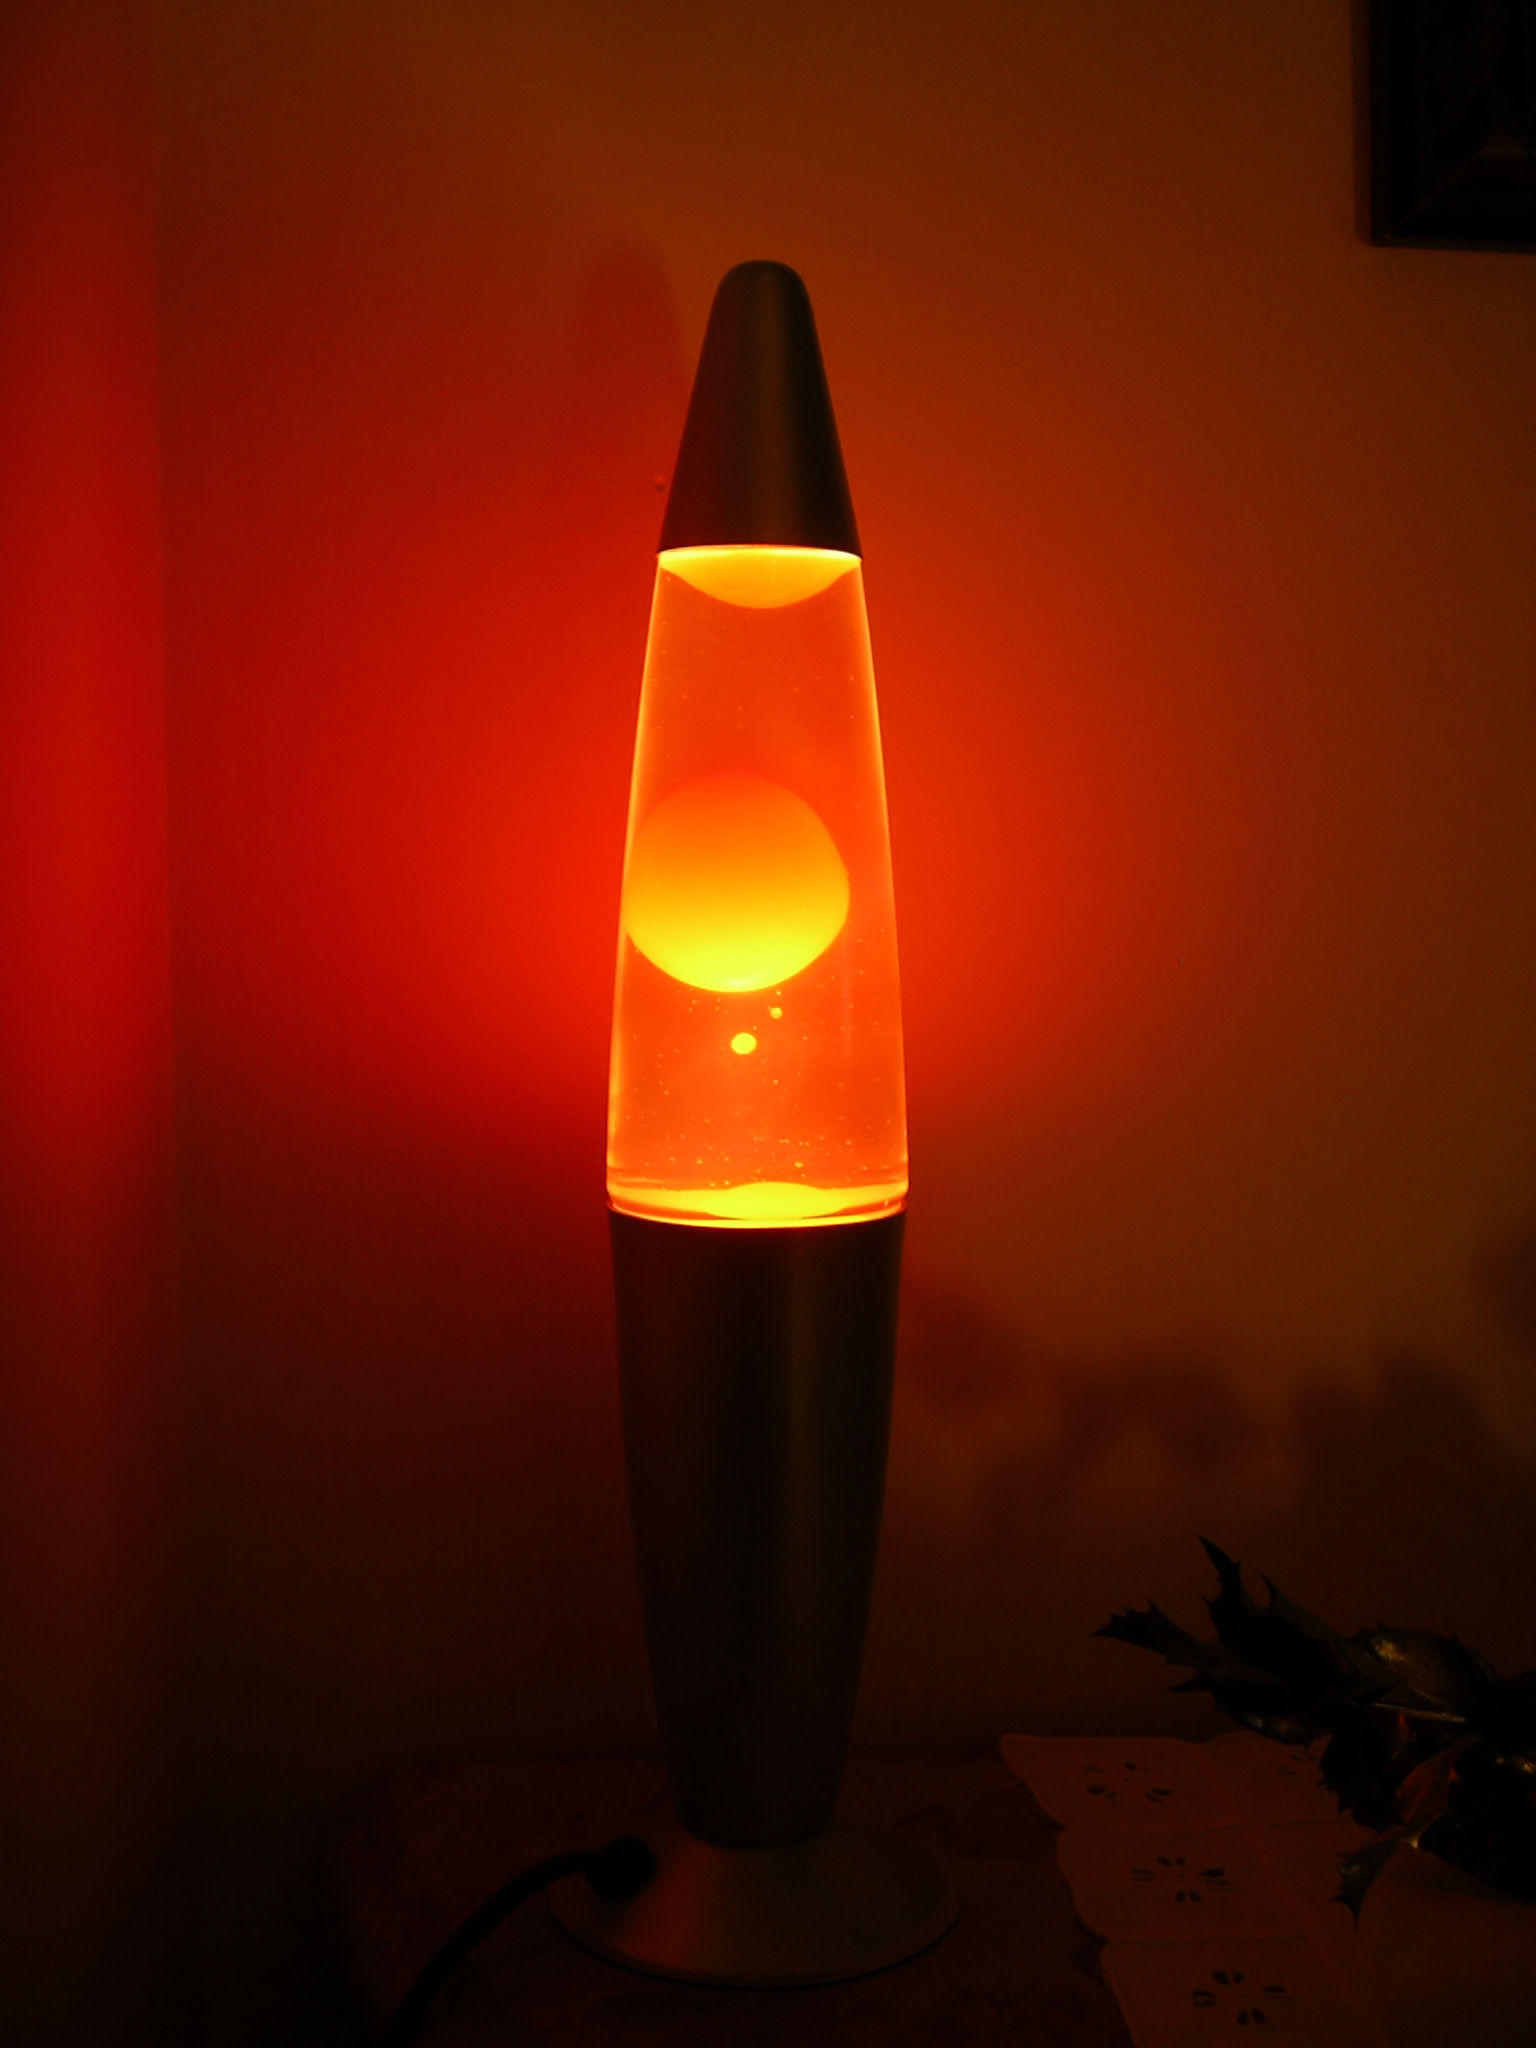 ... life 2005 2015 joelcalado my very own lava lamp i love lava lamps lol